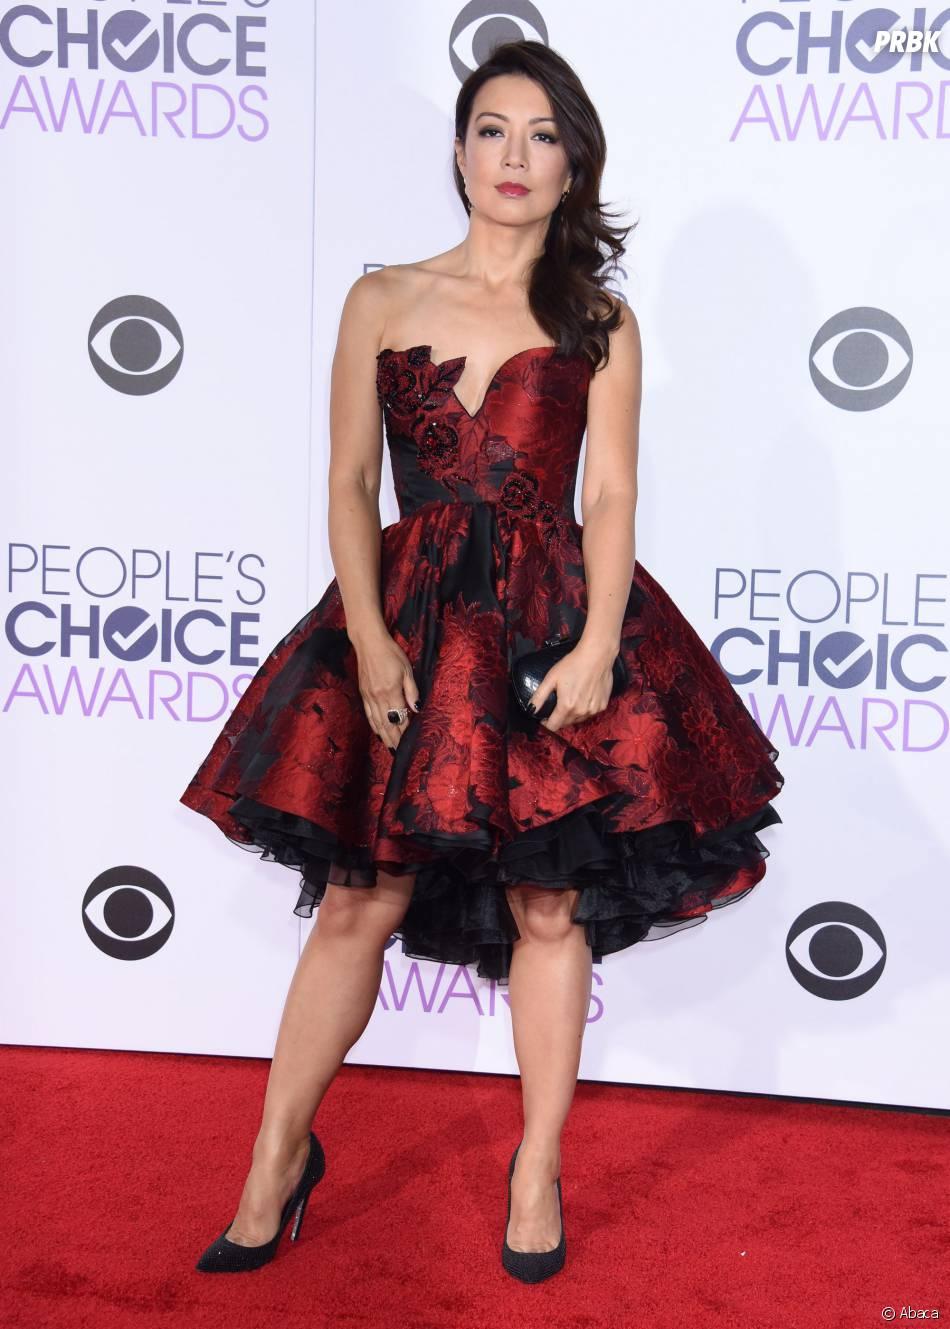 People's Choice Awards 2016 : MingNa Wensur le tapis rouge le 6 janvier